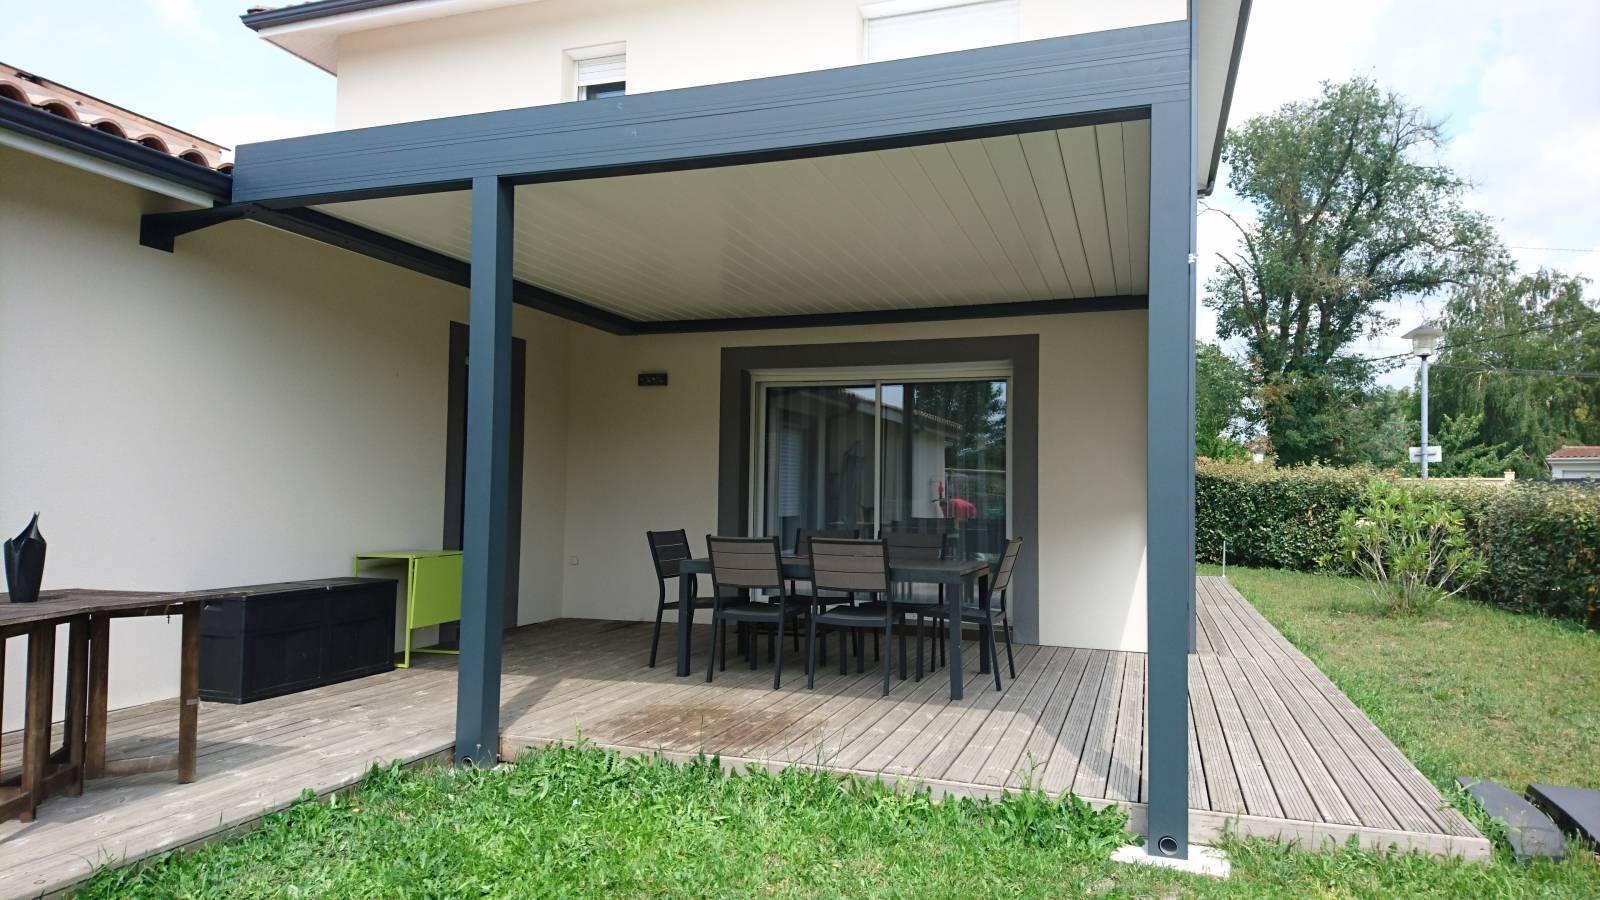 nouvelle pergola ambre veranco fabricant et installateur de pergola bioclimatique et carport. Black Bedroom Furniture Sets. Home Design Ideas